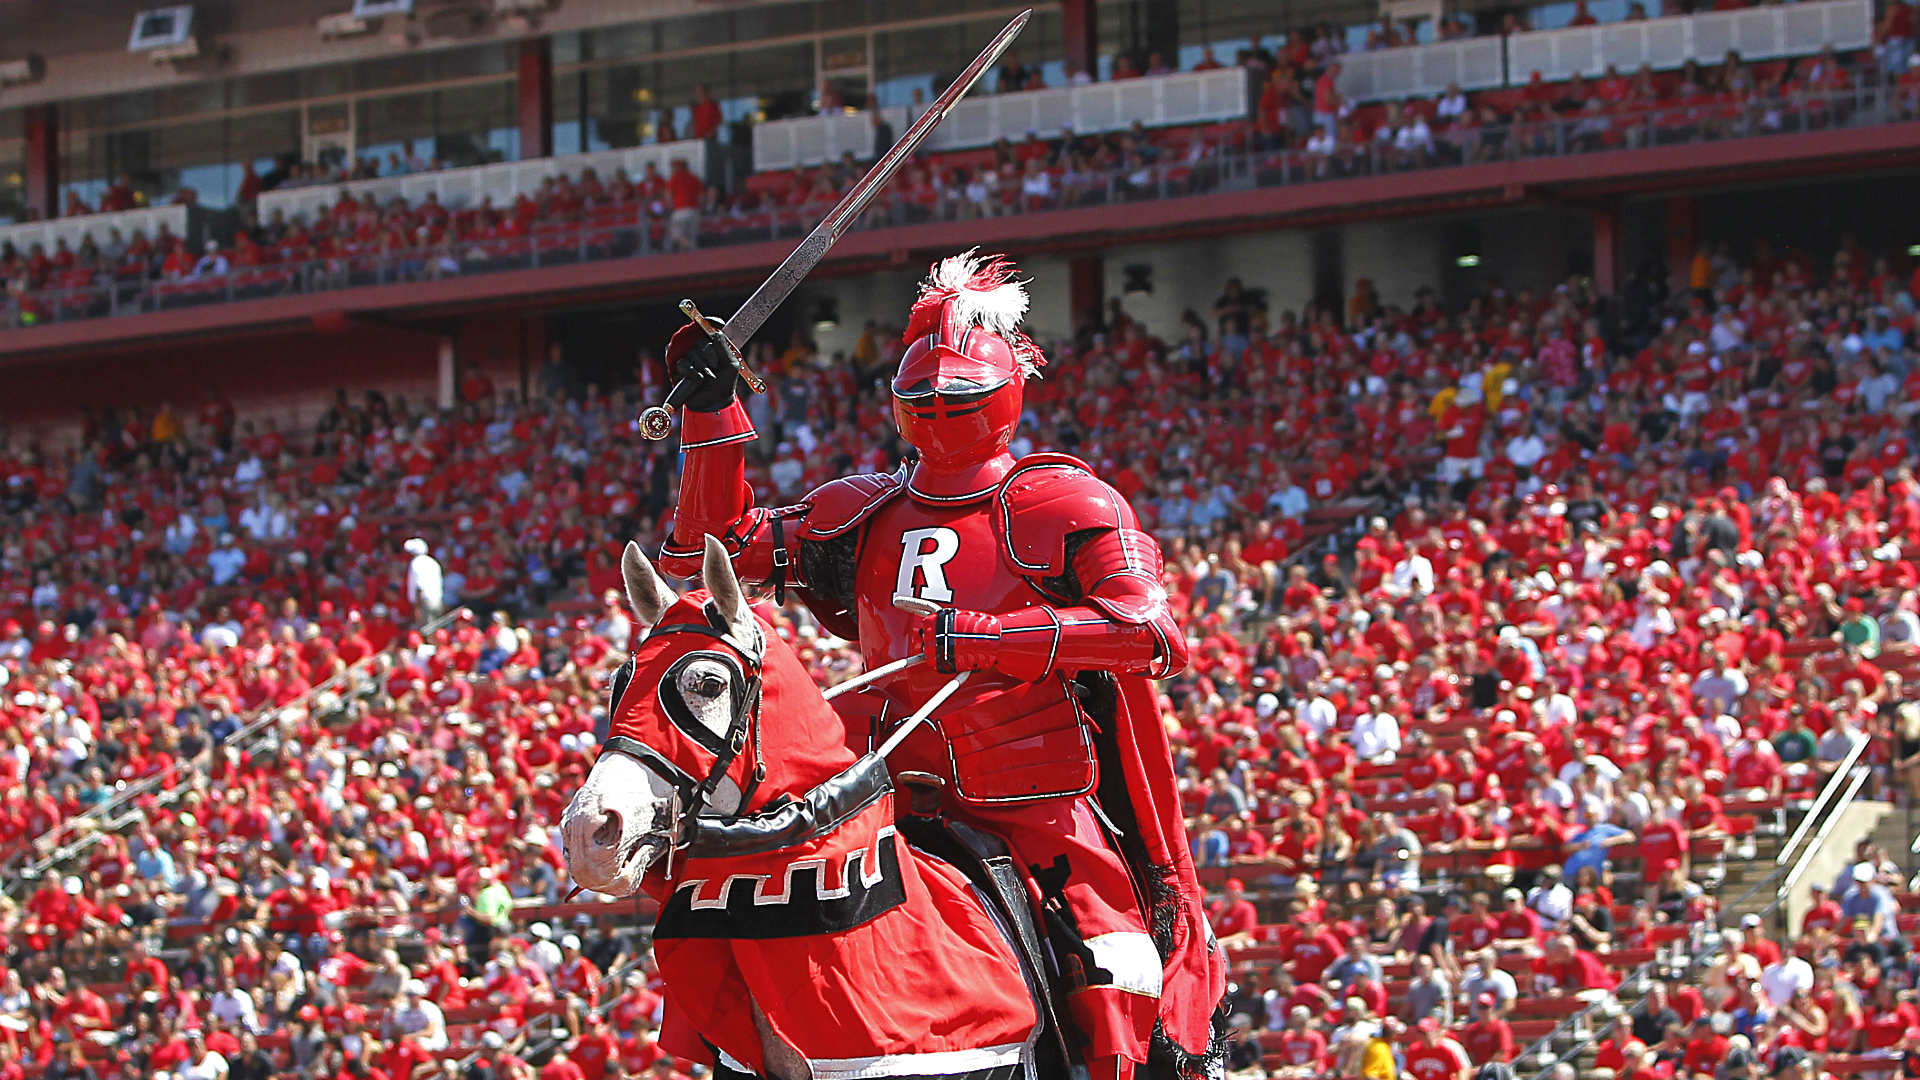 Rutgers-Football-091015-USNews-Getty-FTR